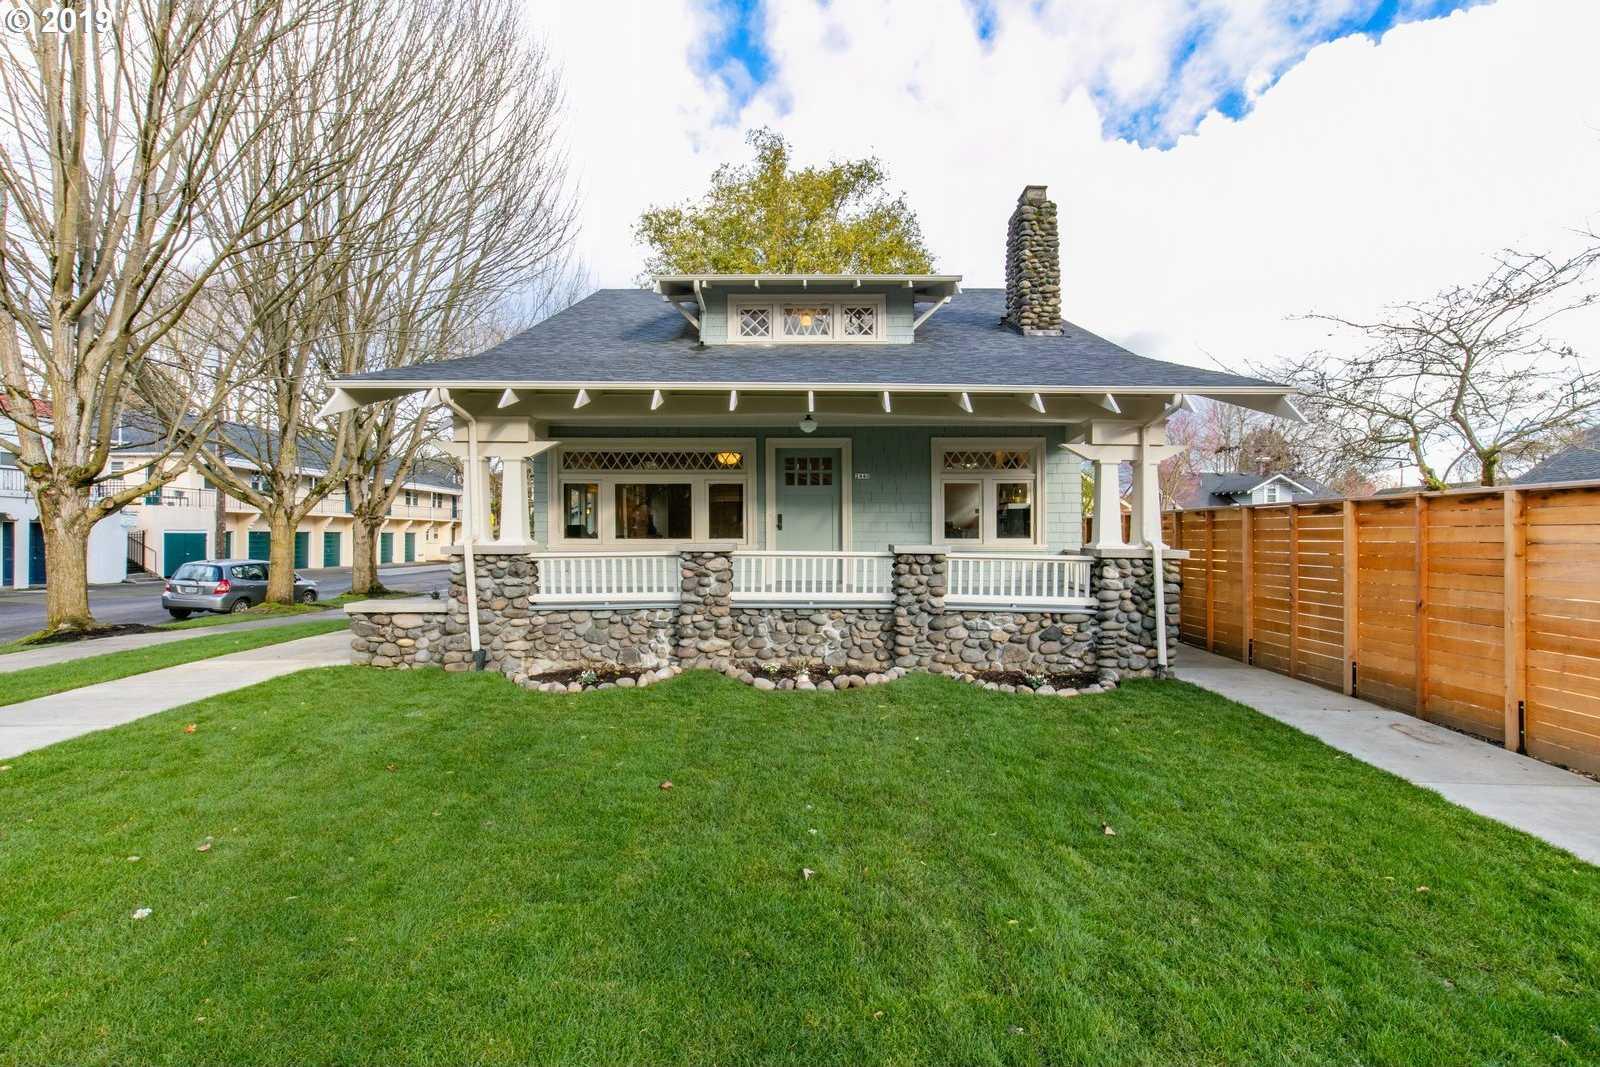 $1,049,900 - 6Br/4Ba -  for Sale in Irvington, Portland